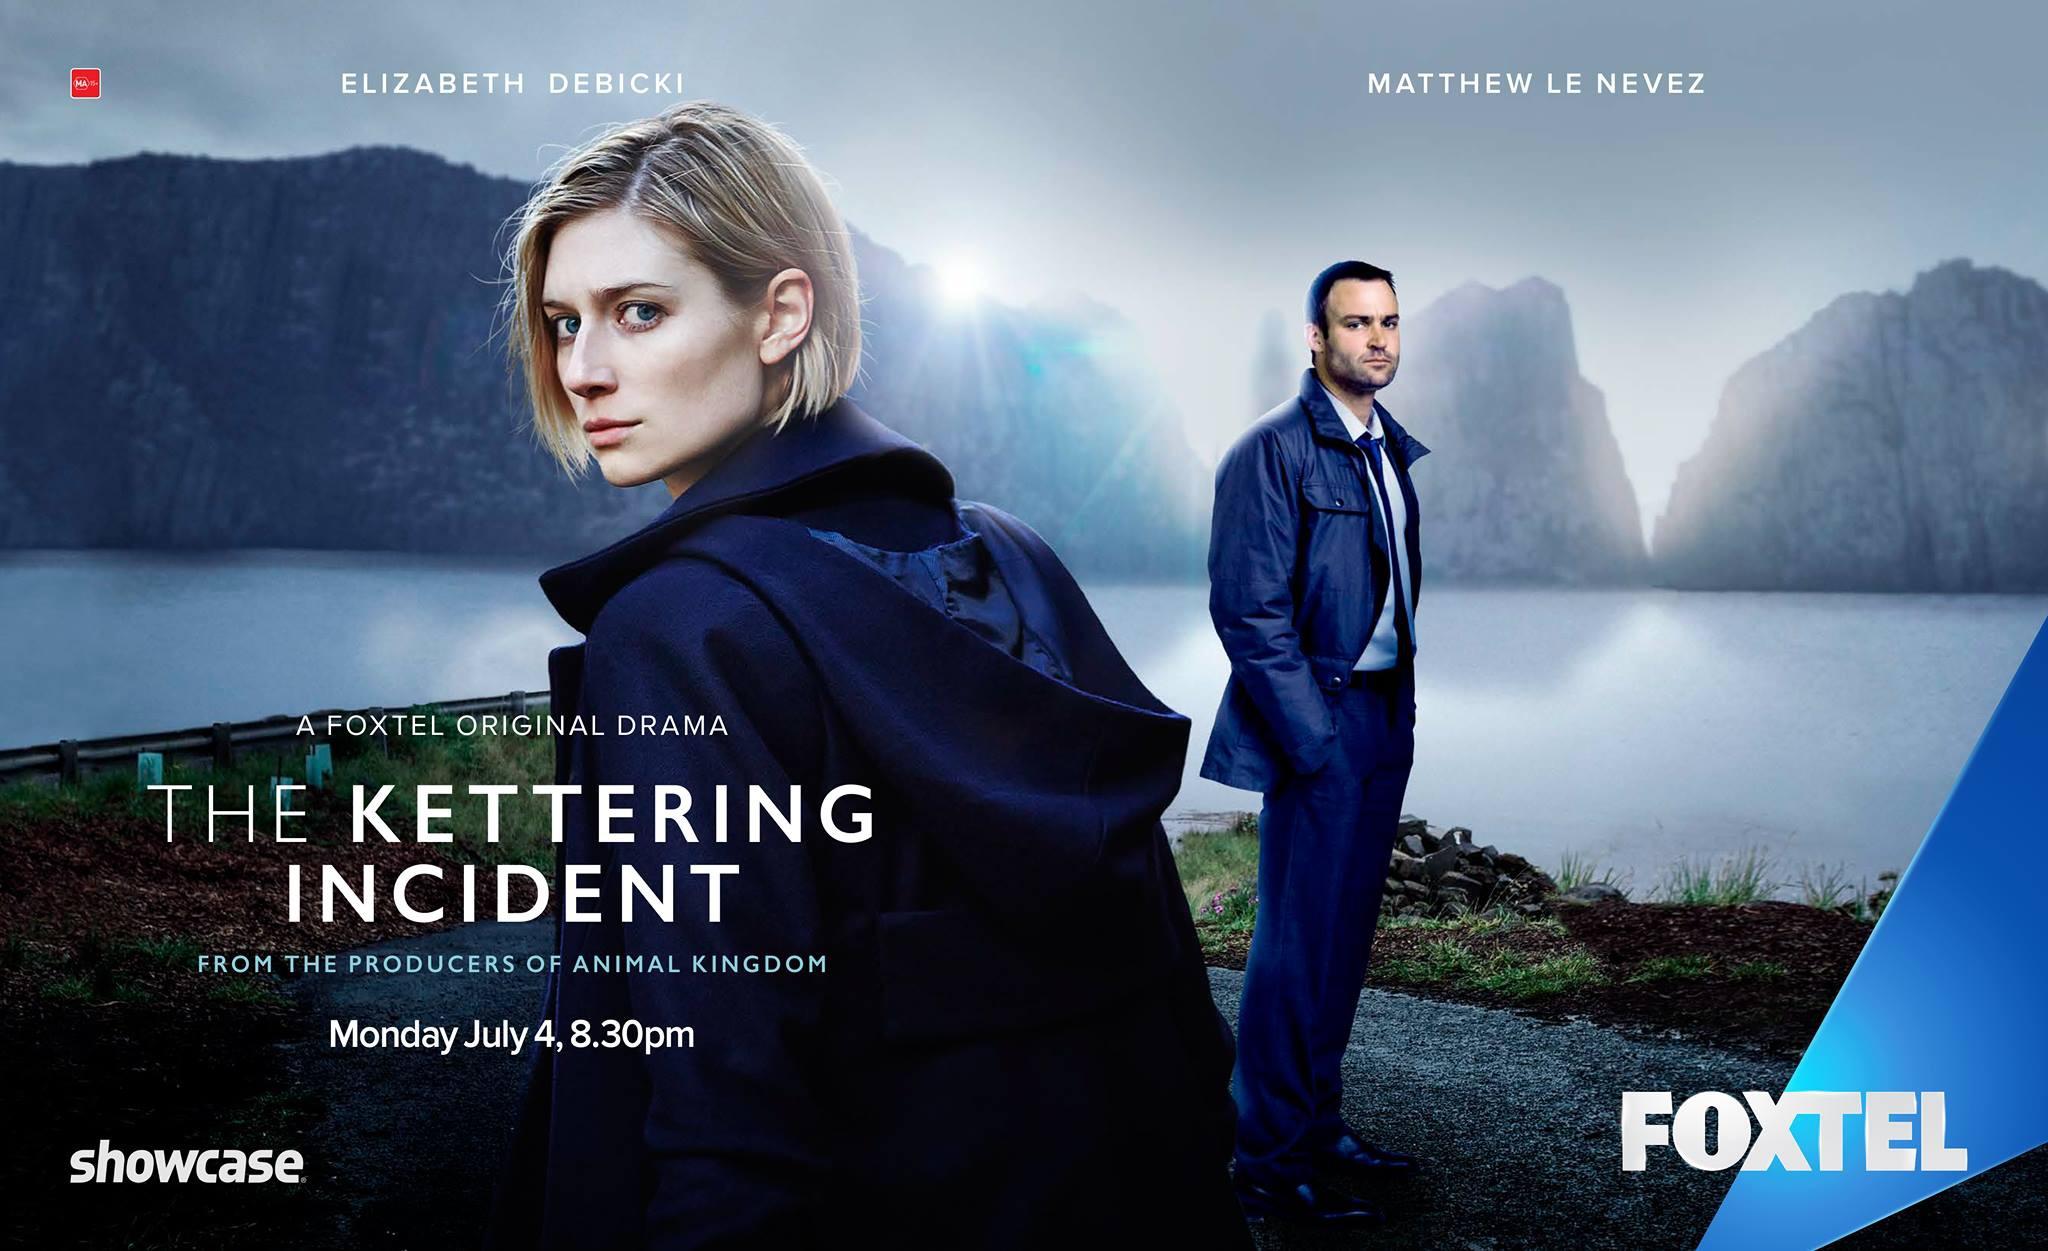 The-Kettering-Incident-Season-1_poster_goldposter_com_1.jpg